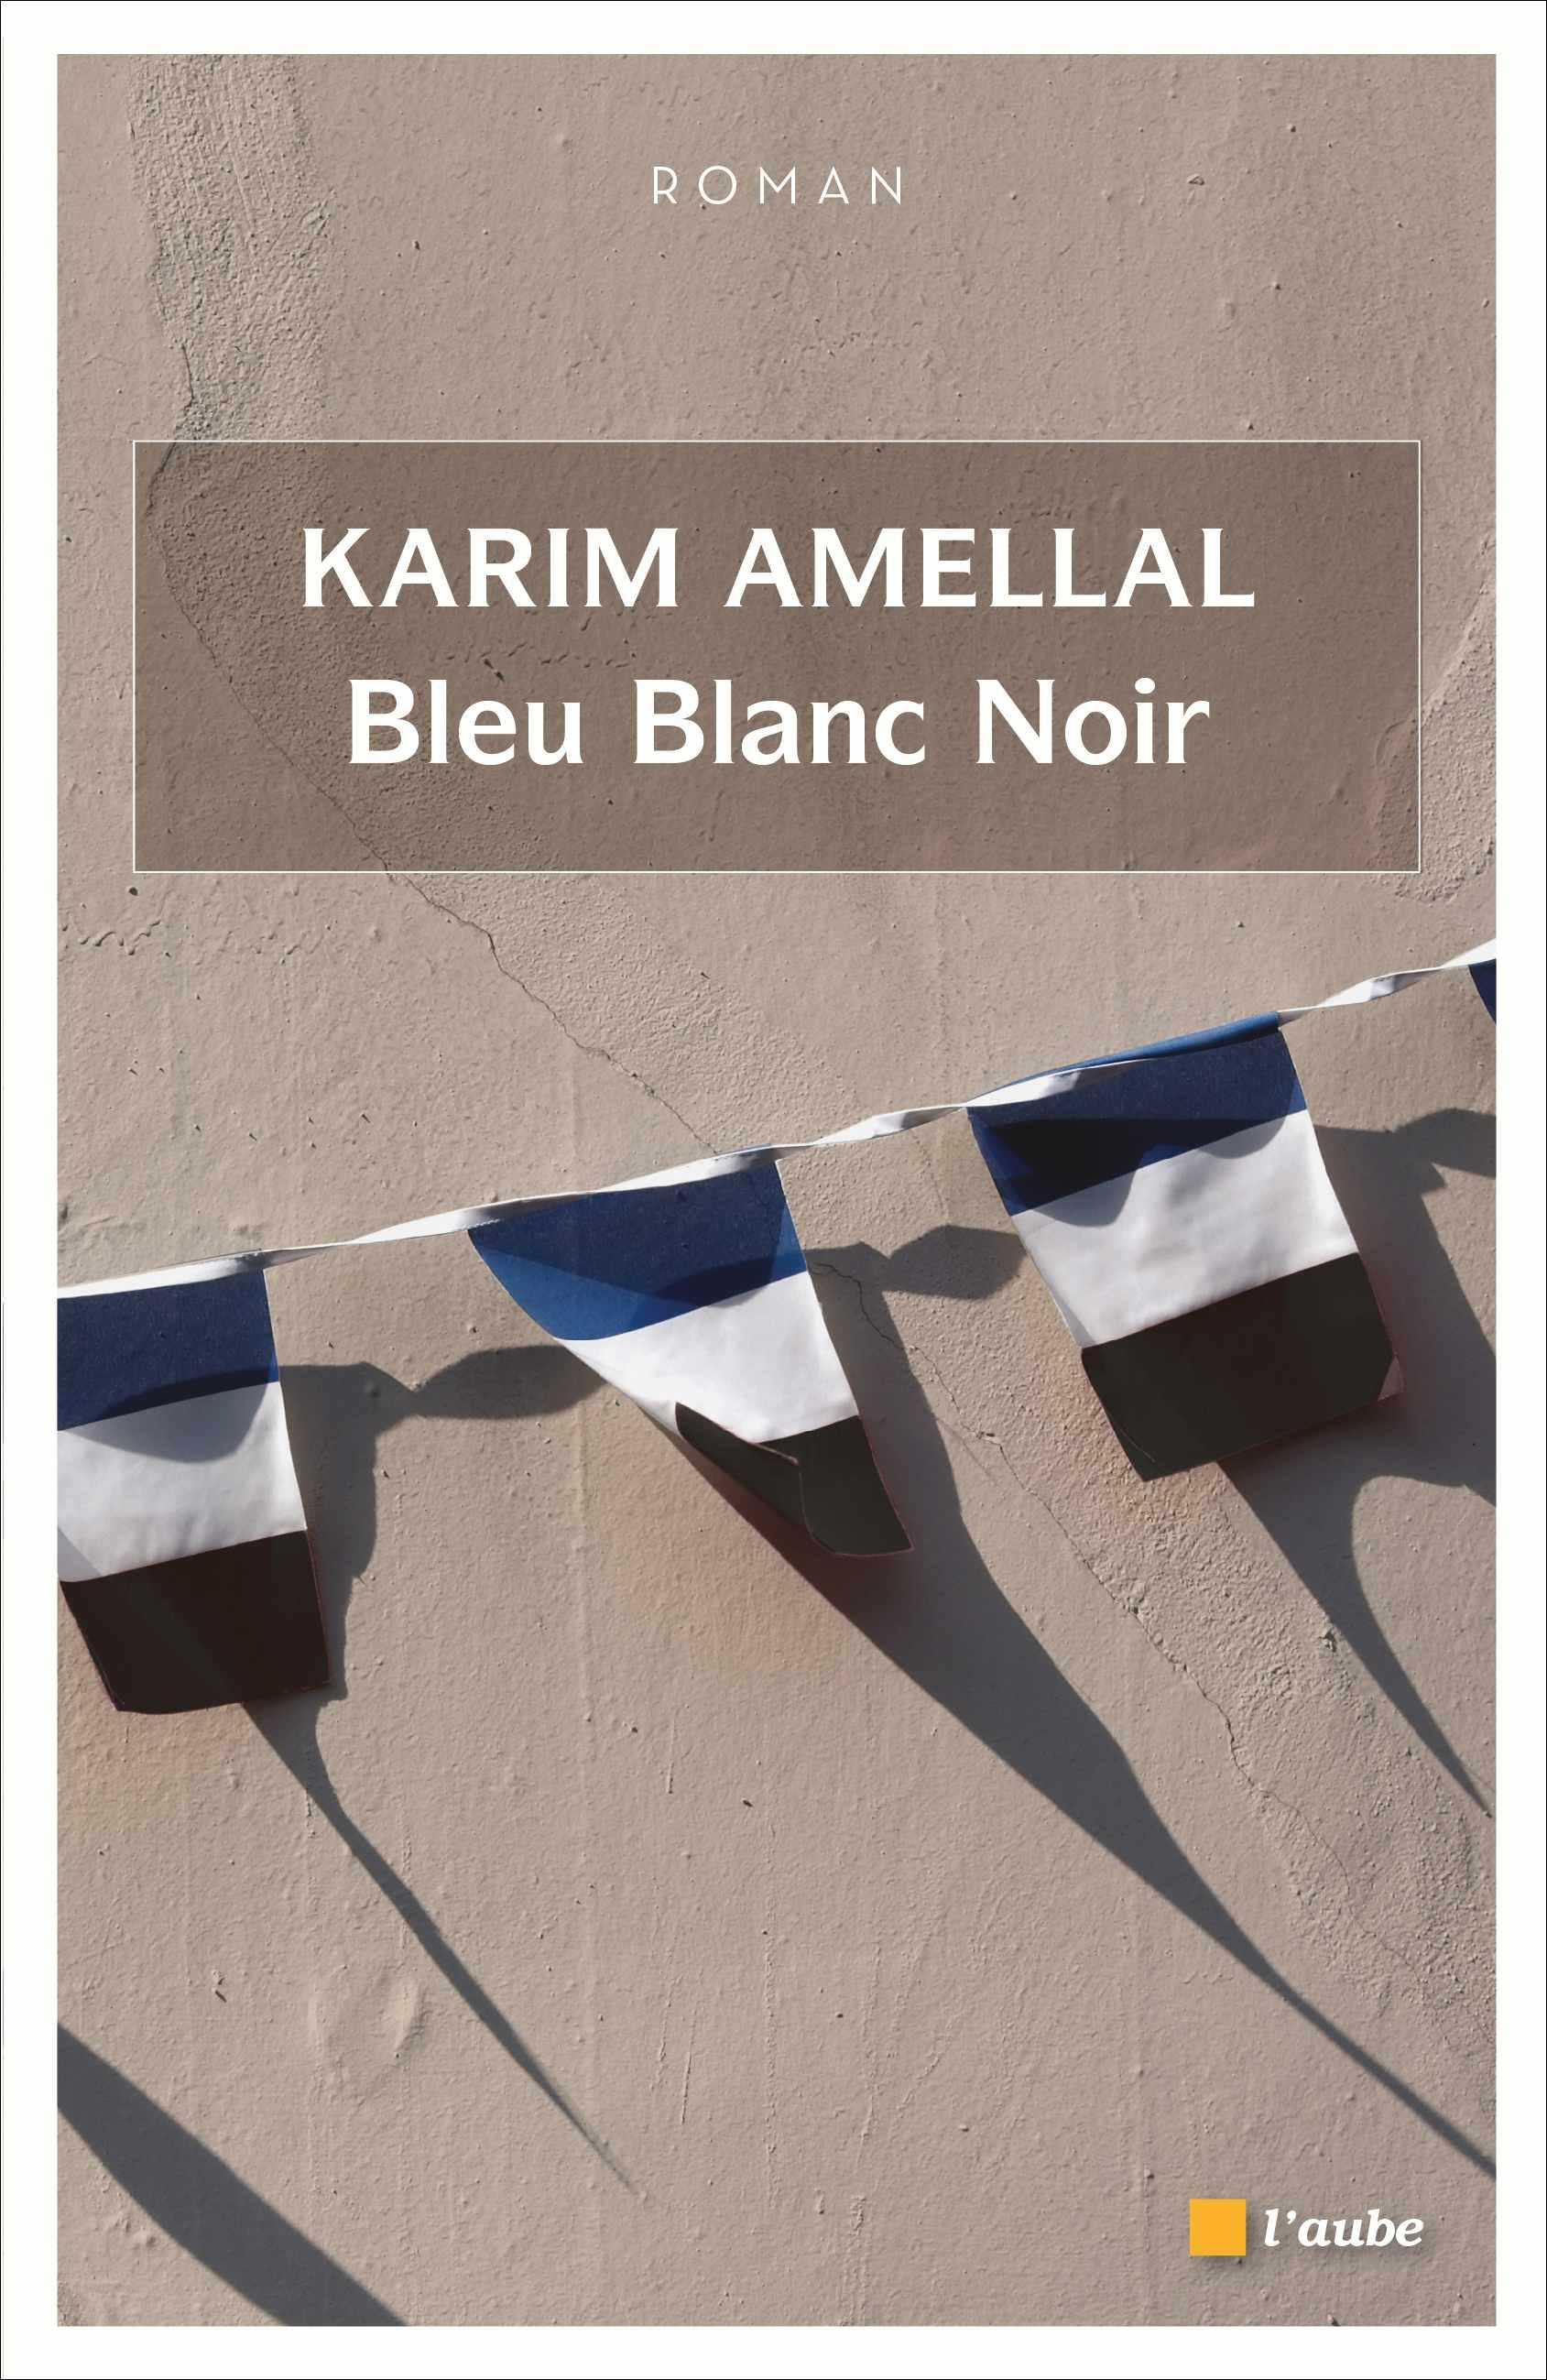 Bleu Blanc Noir